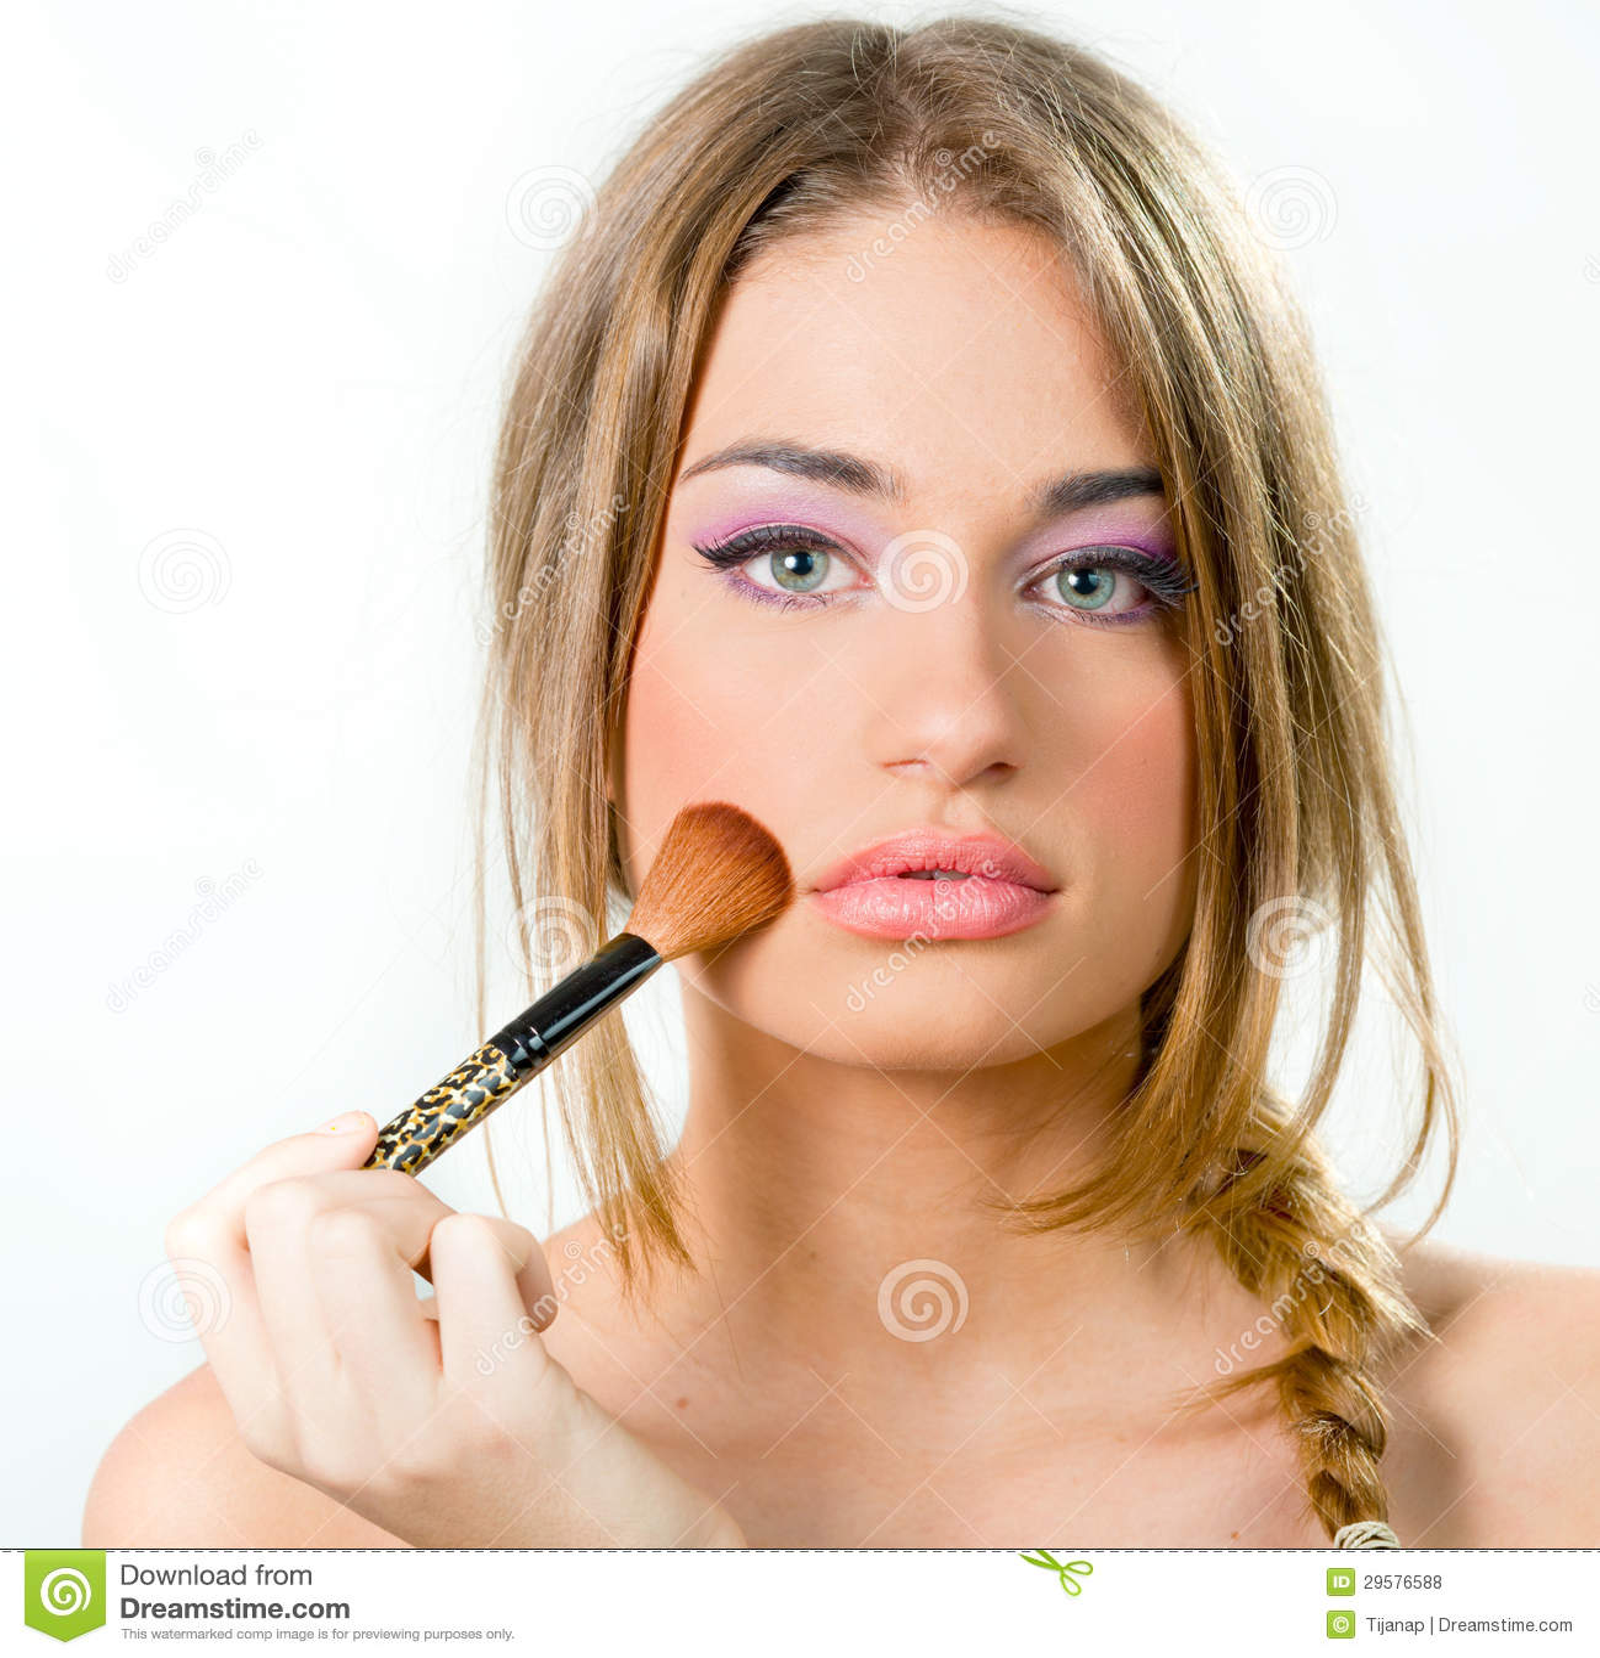 nude woman putting on makeup